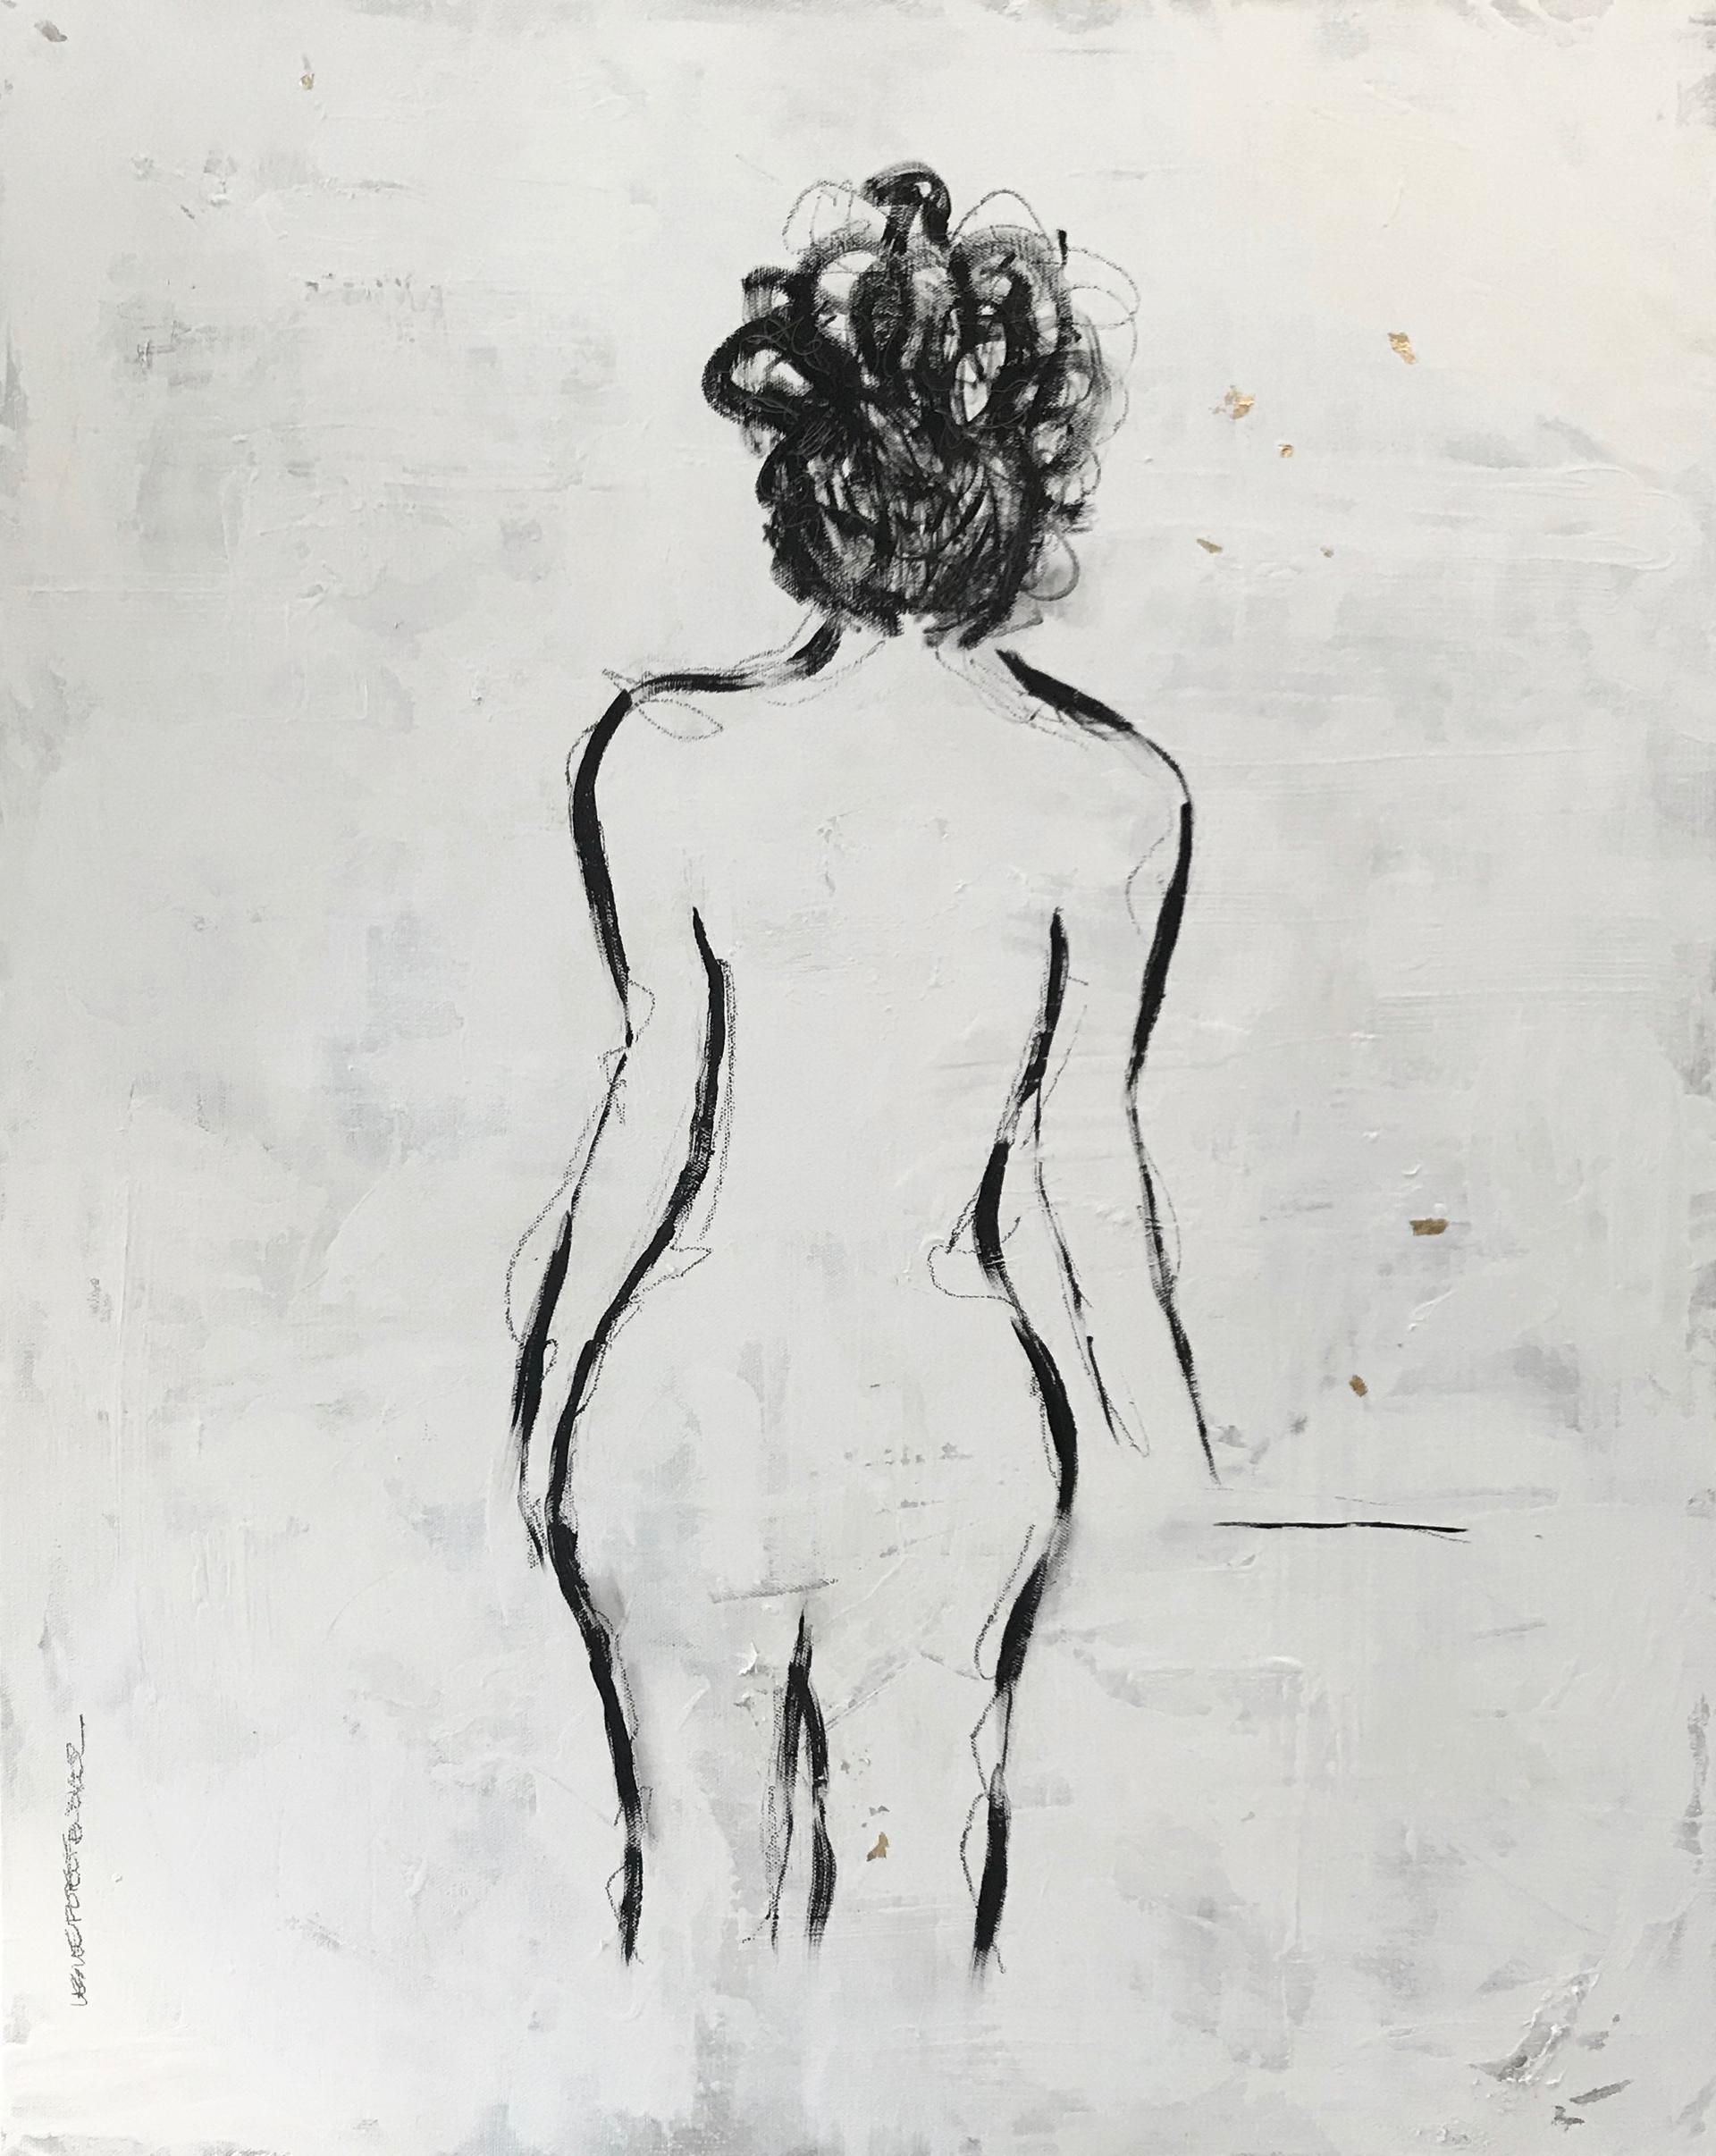 Figure No. 130 by Leslie Poteet Busker